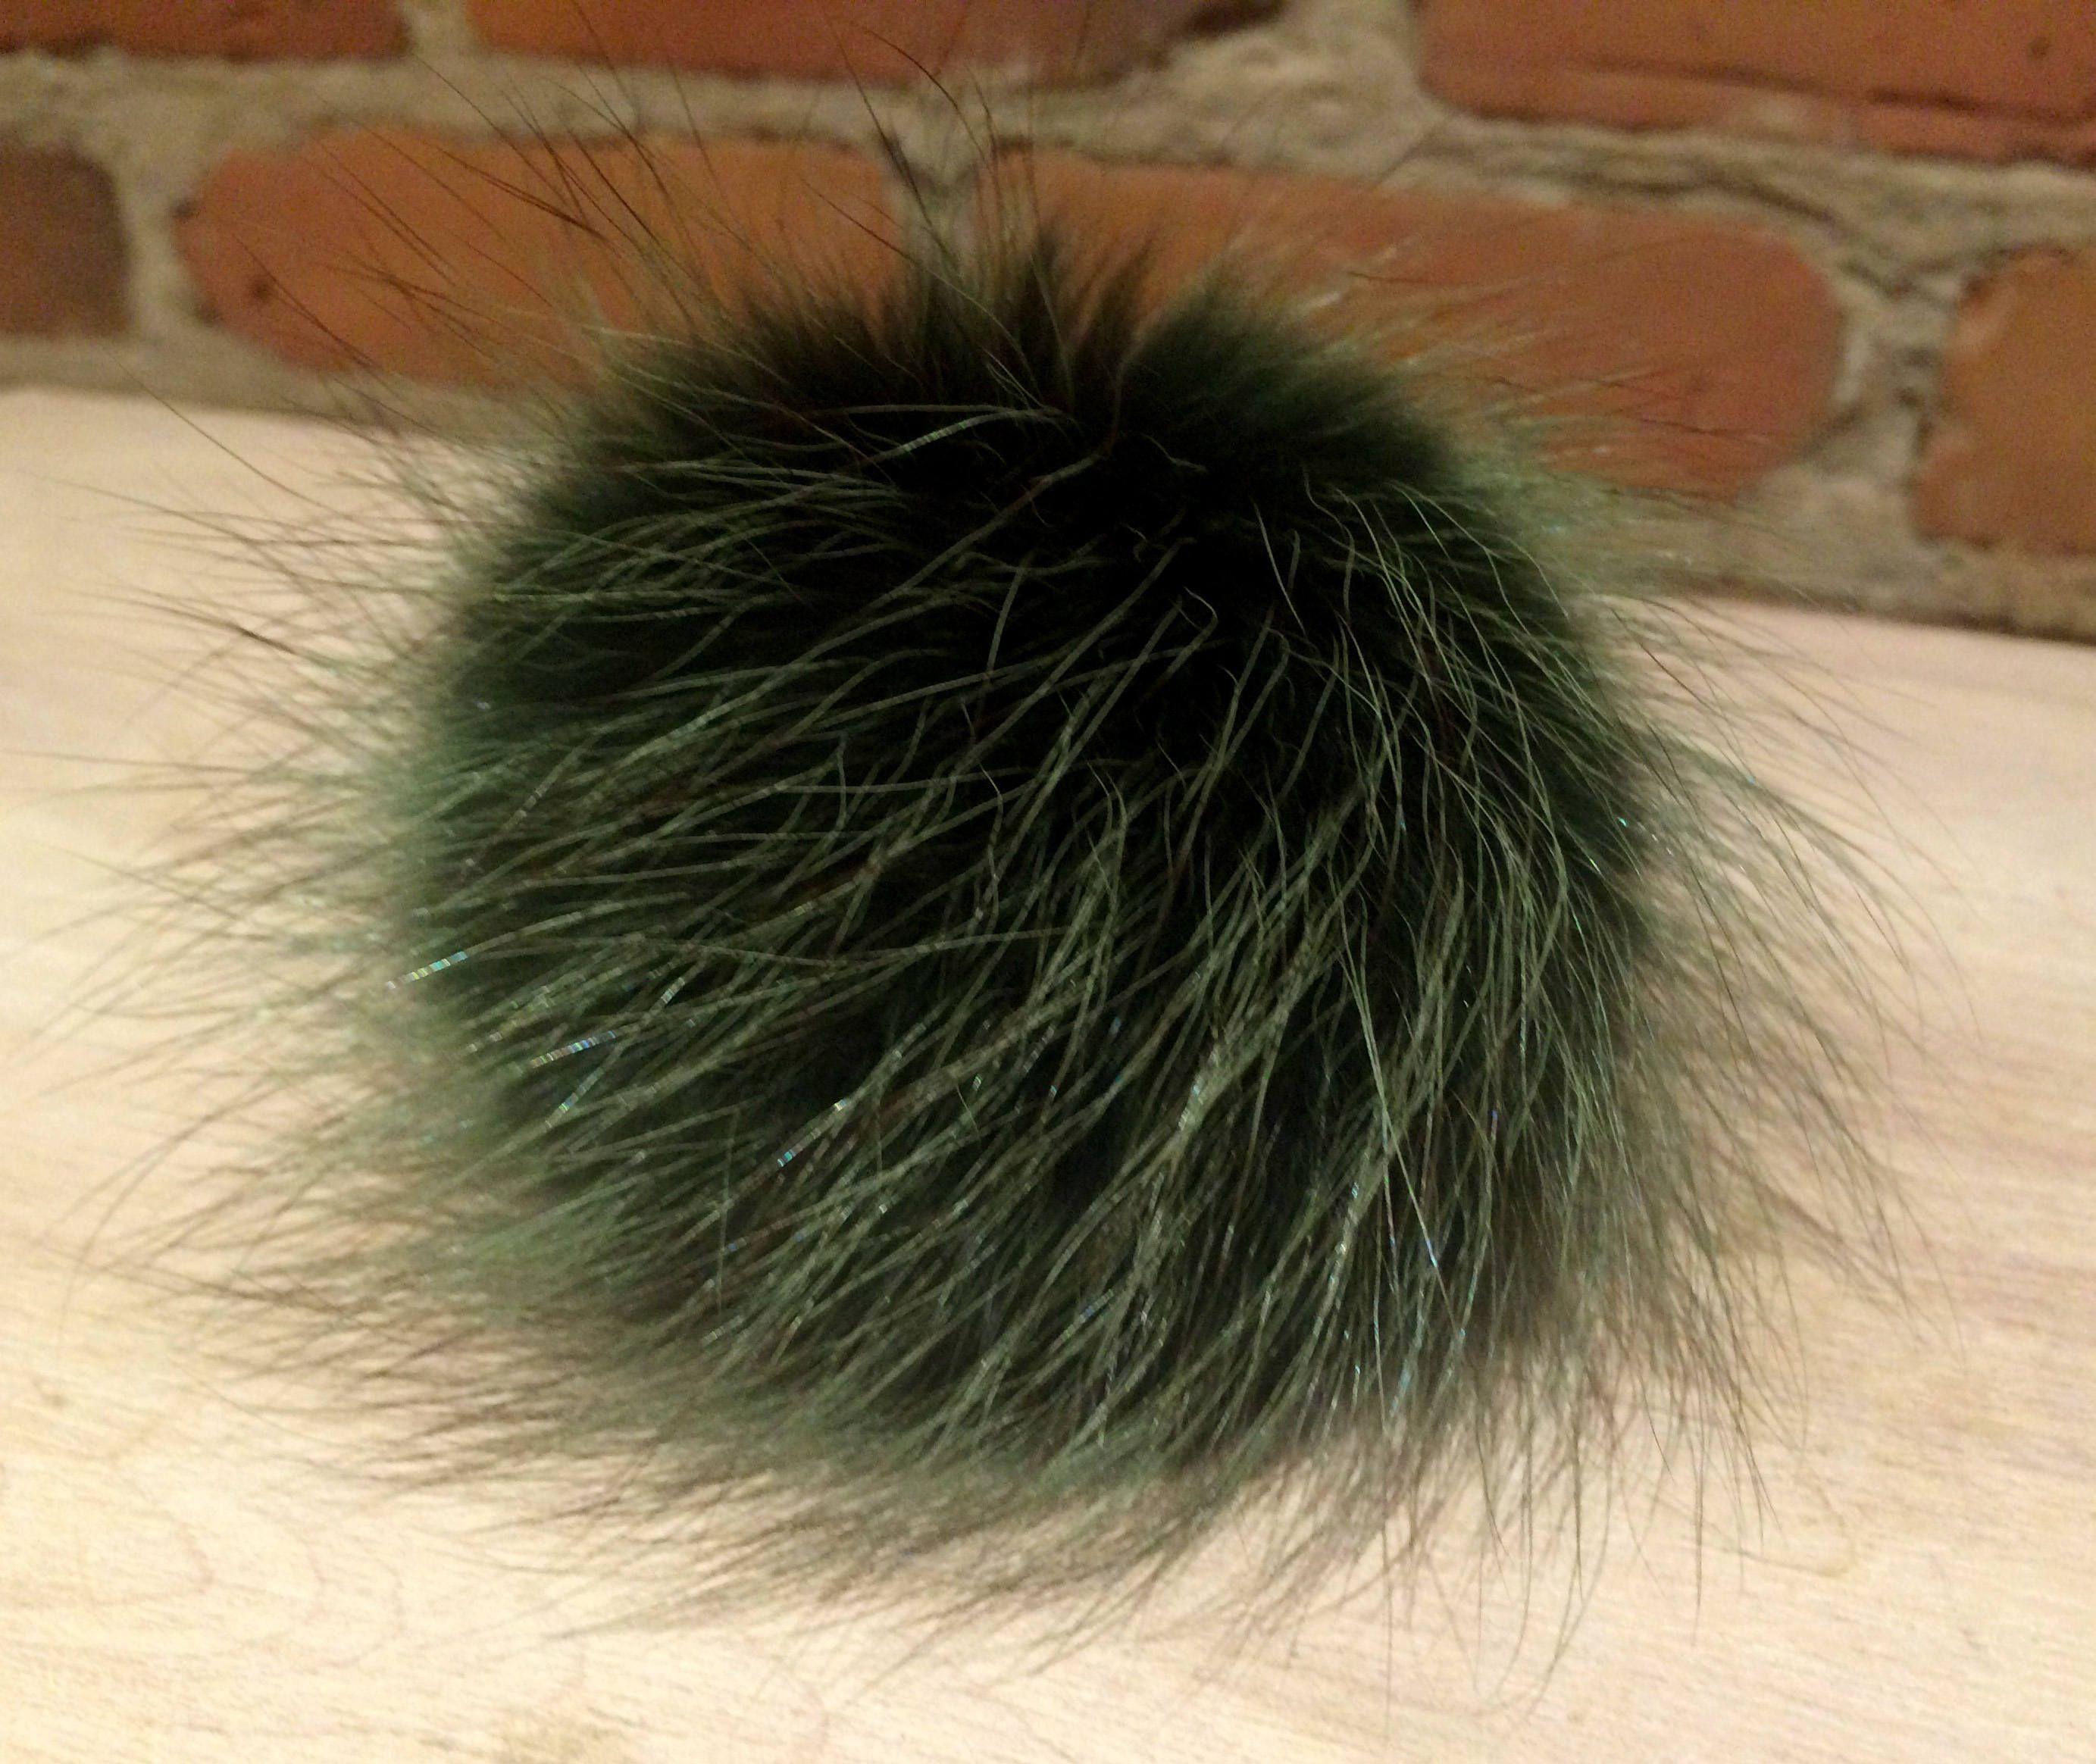 2cdc29511 Hat Pom, Green Pom Pom, 3.5 Inch, Raccoon Fur, Emerald Green ...